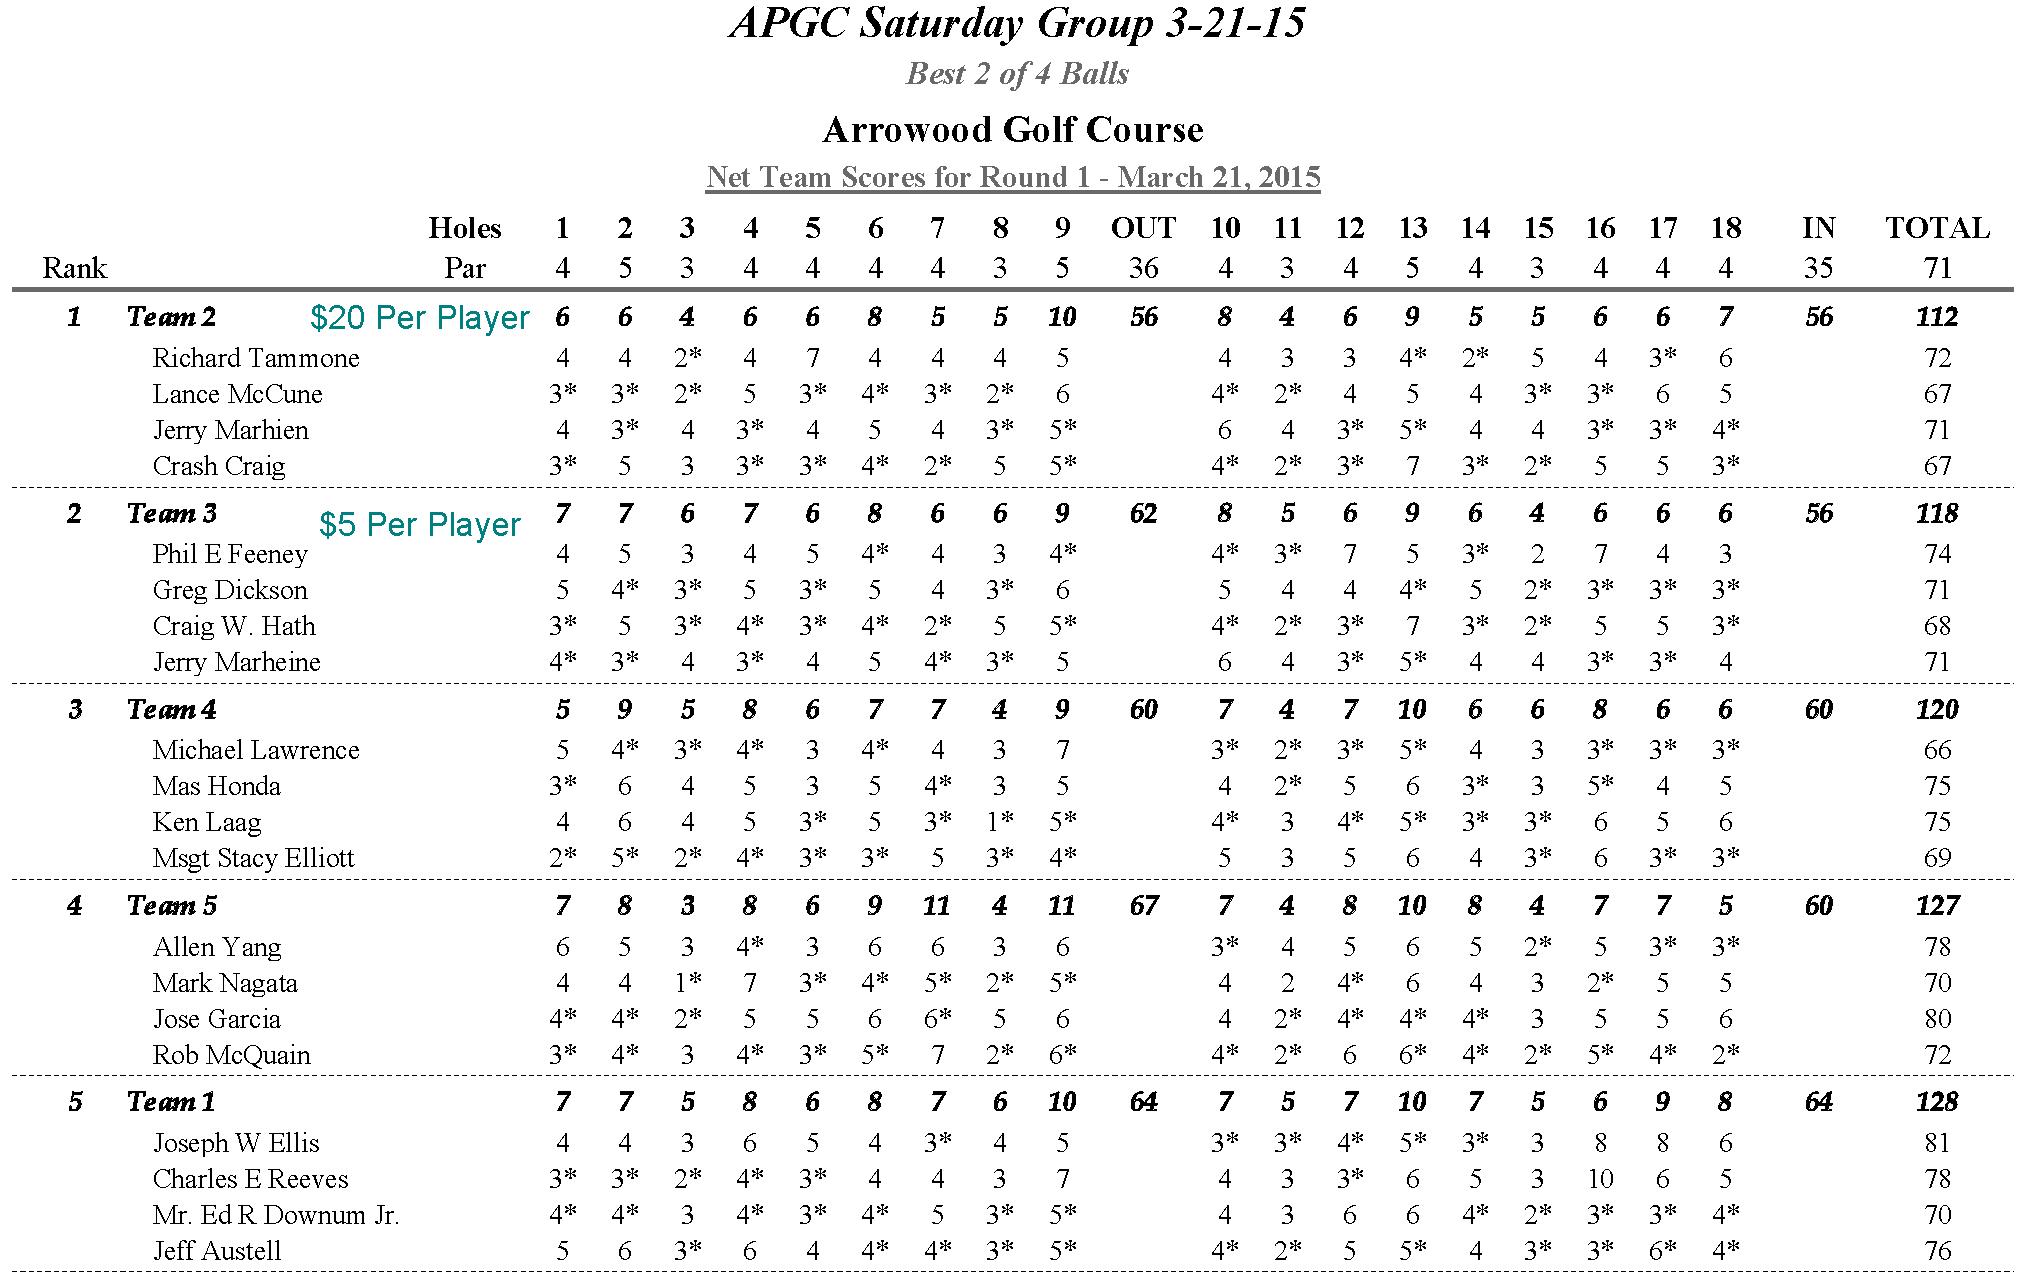 APGC Saturday 3-21-15